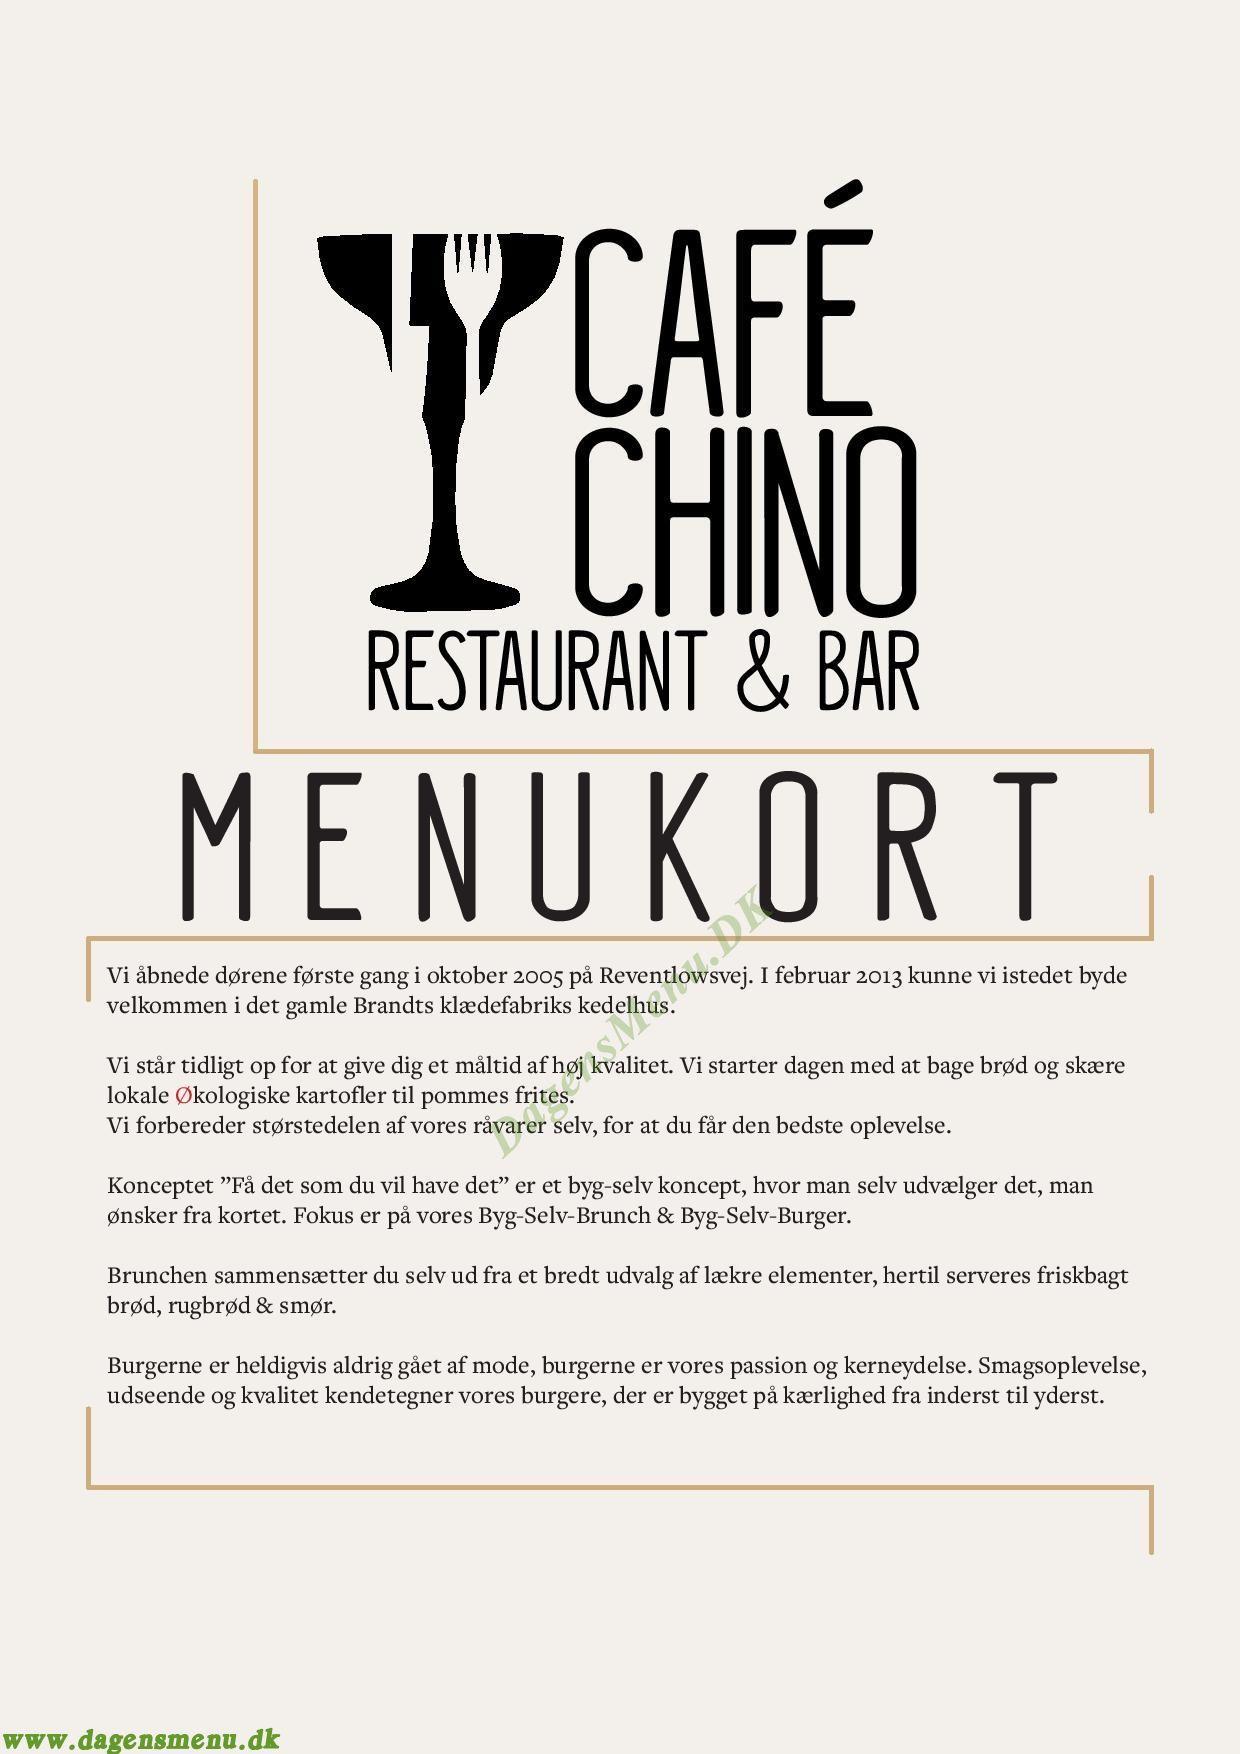 Café Chino - Menukort